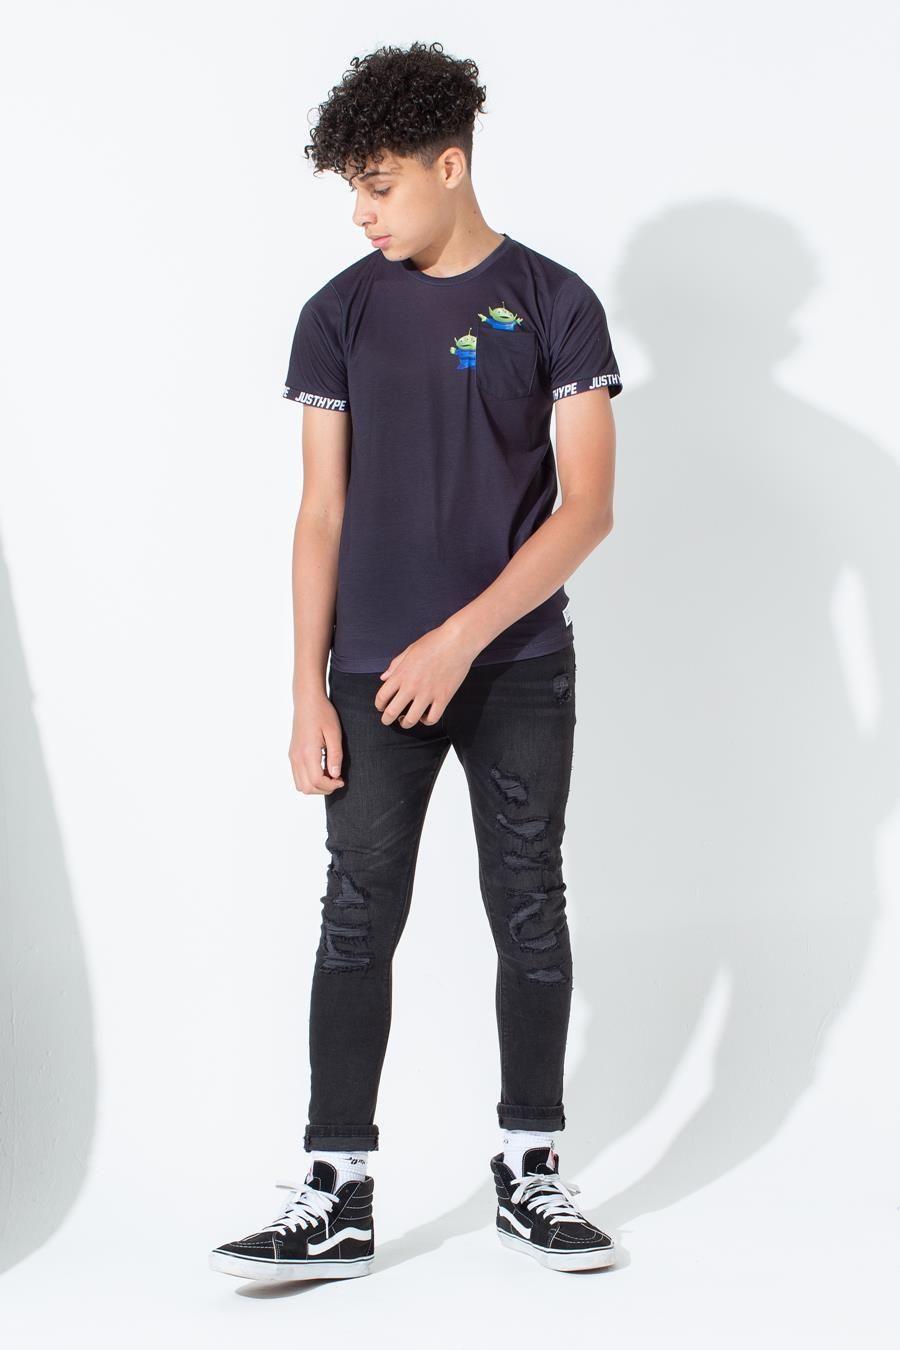 Hype Toy Story Black Aliens Pocket Kids T-Shirt